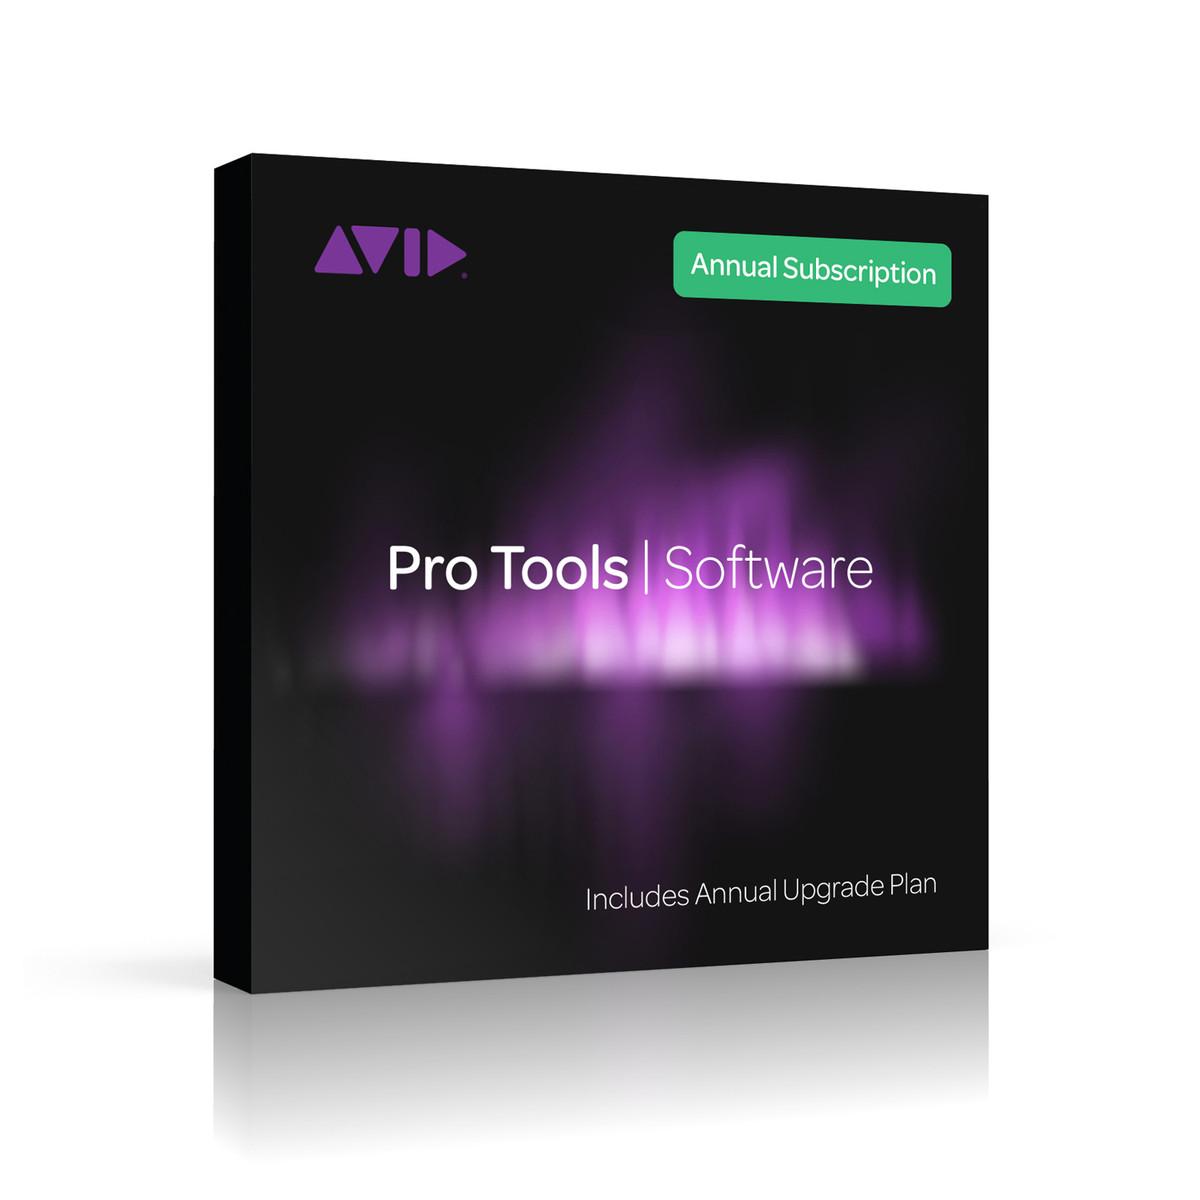 Image of Avid Pro Tools Student/Teacher Annual Subscription